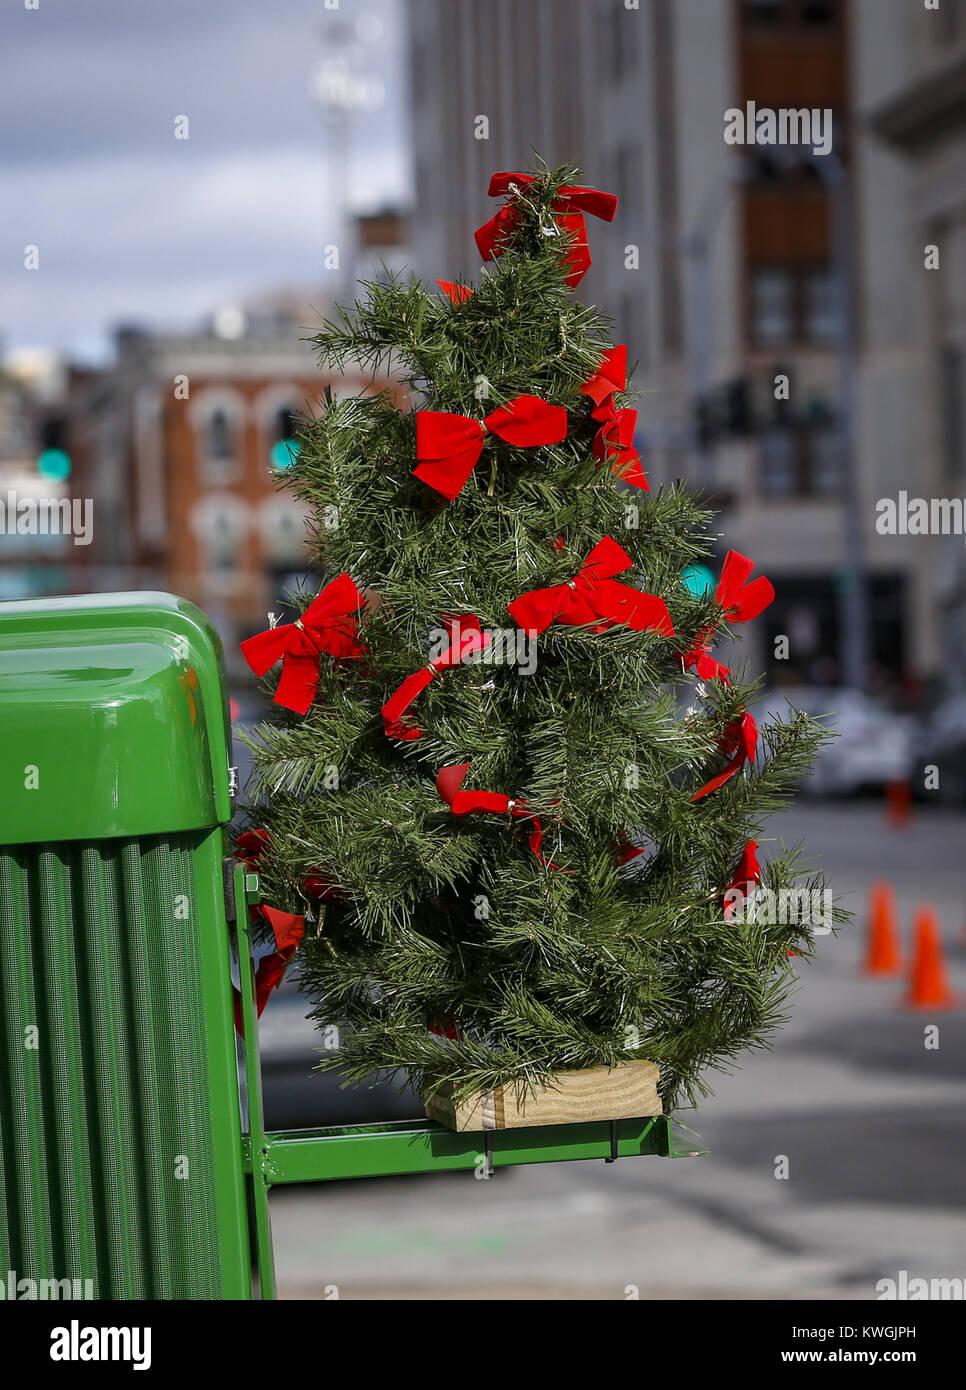 Christmas Tree Trees Tractor Stock Photos & Christmas Tree Trees ...